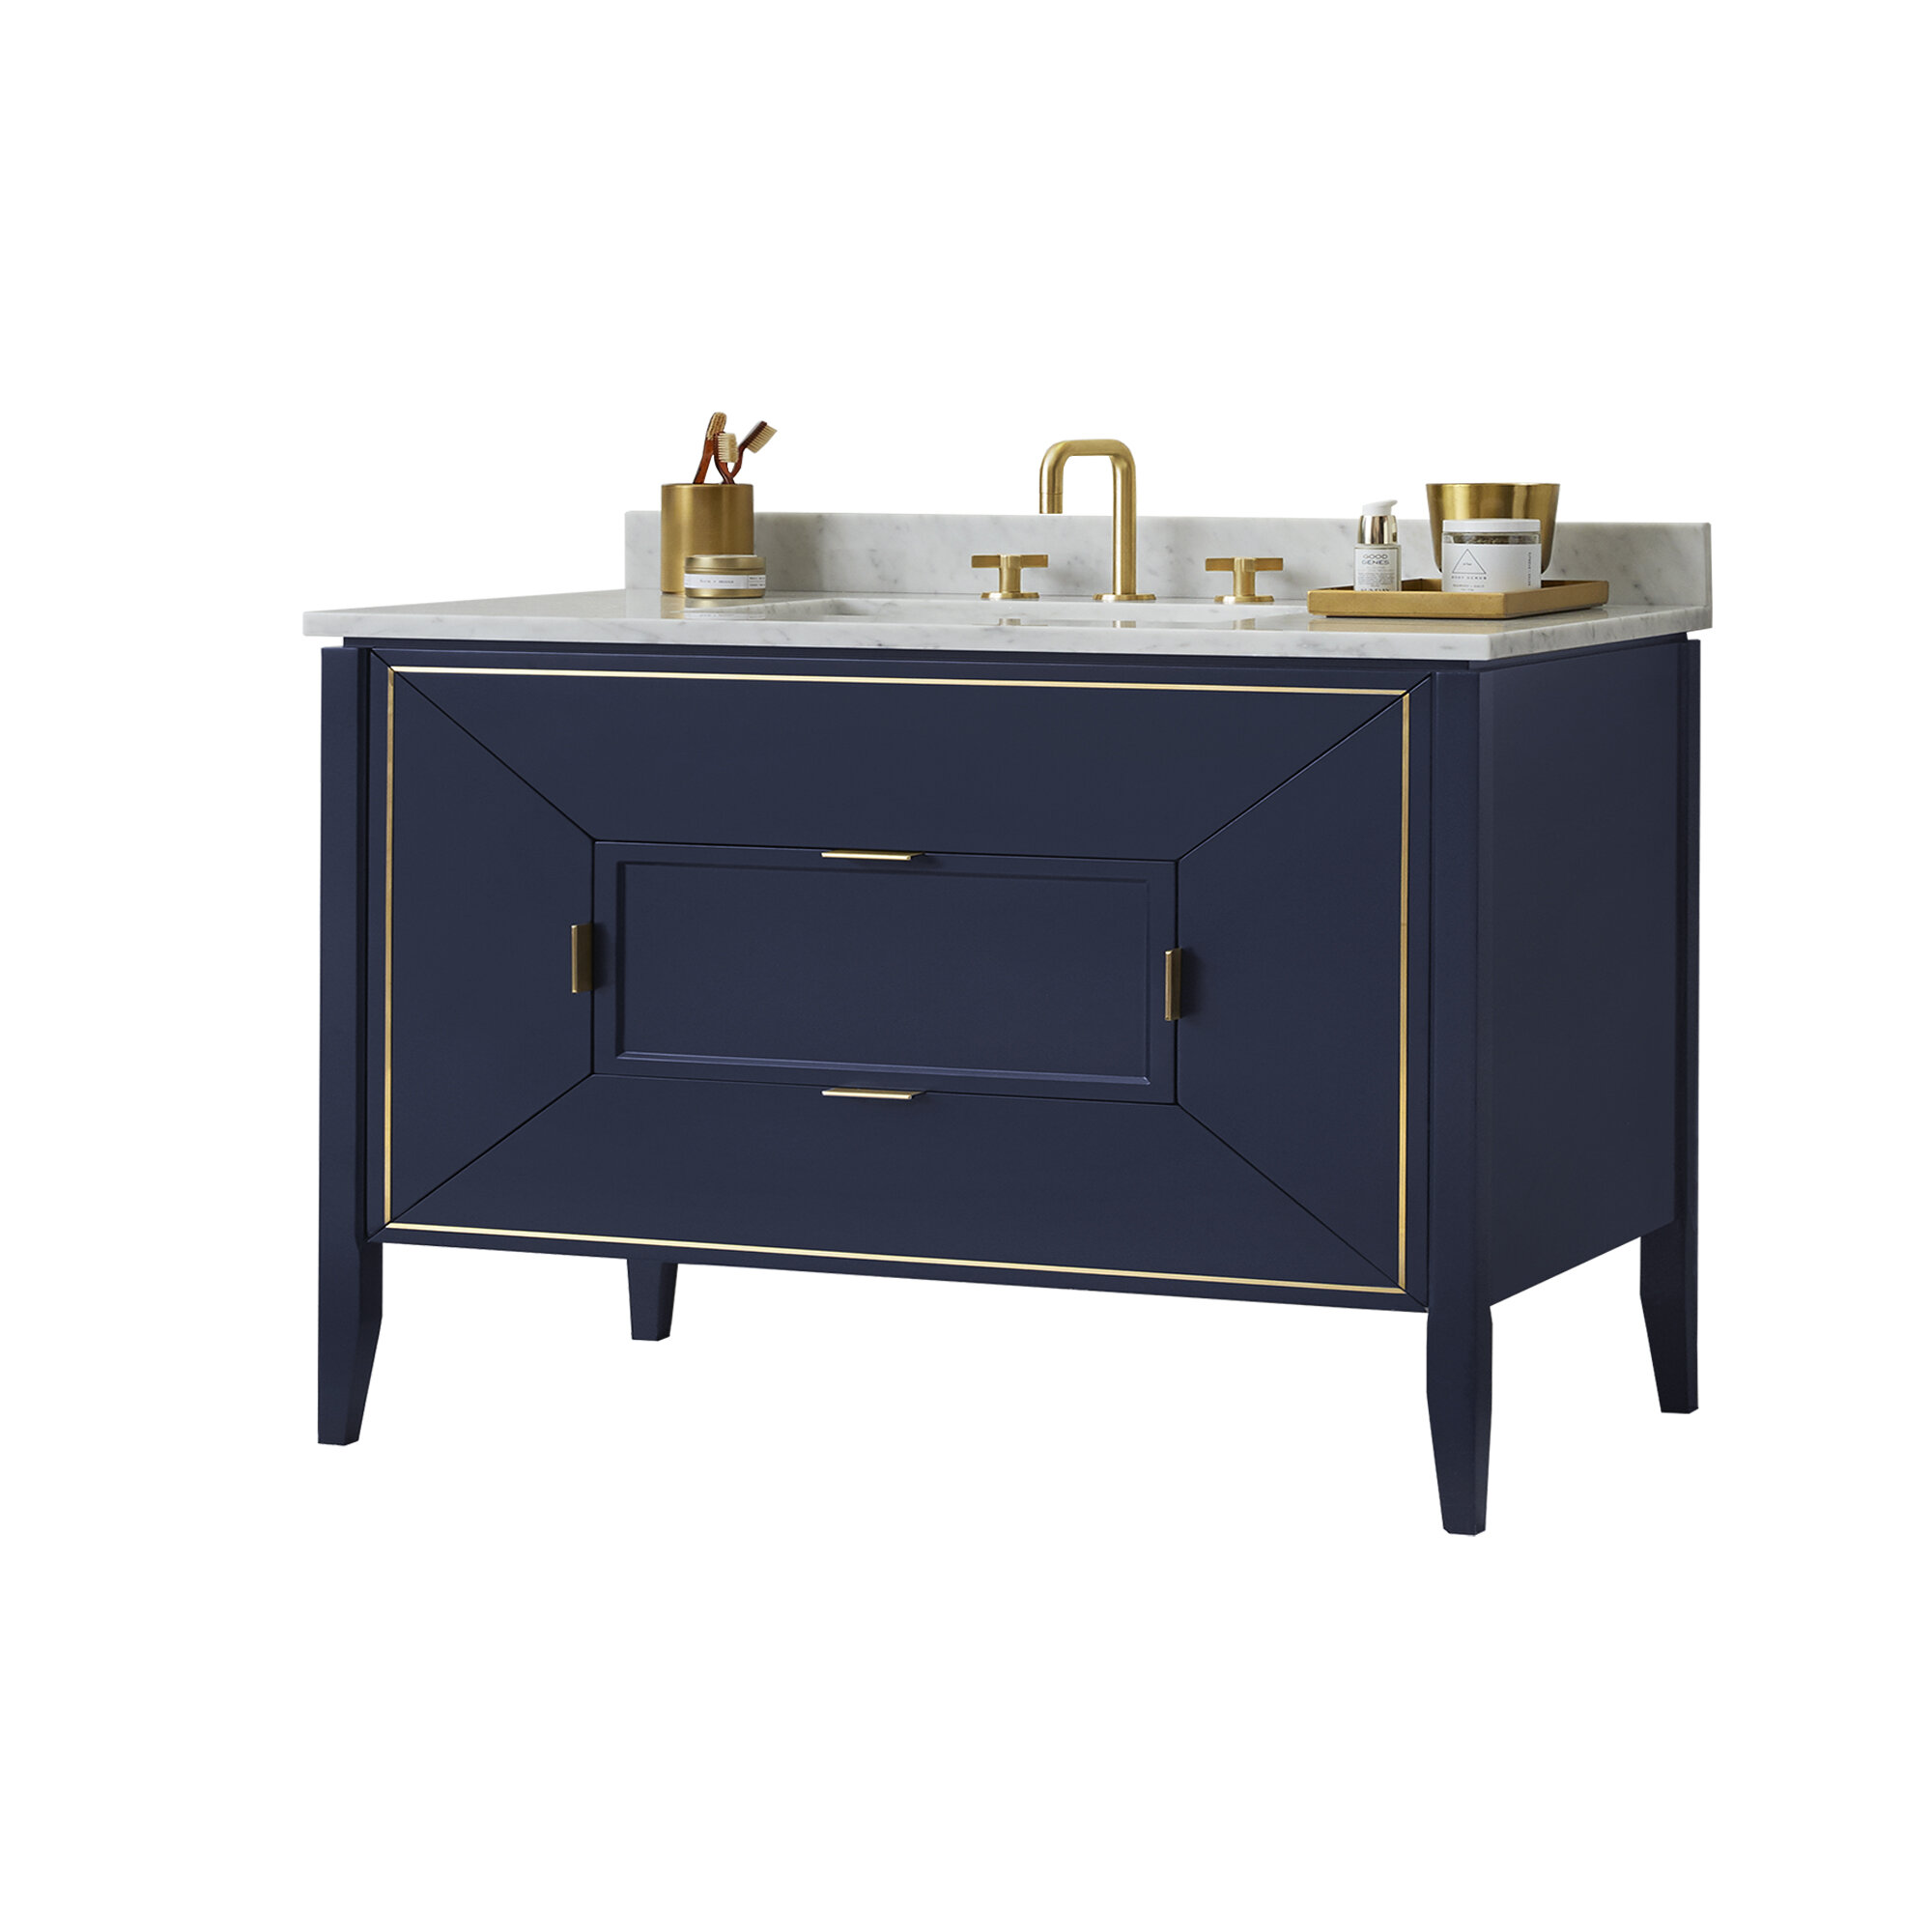 Groovy Amora 48 Single Bathroom Vanity Base Only Download Free Architecture Designs Scobabritishbridgeorg